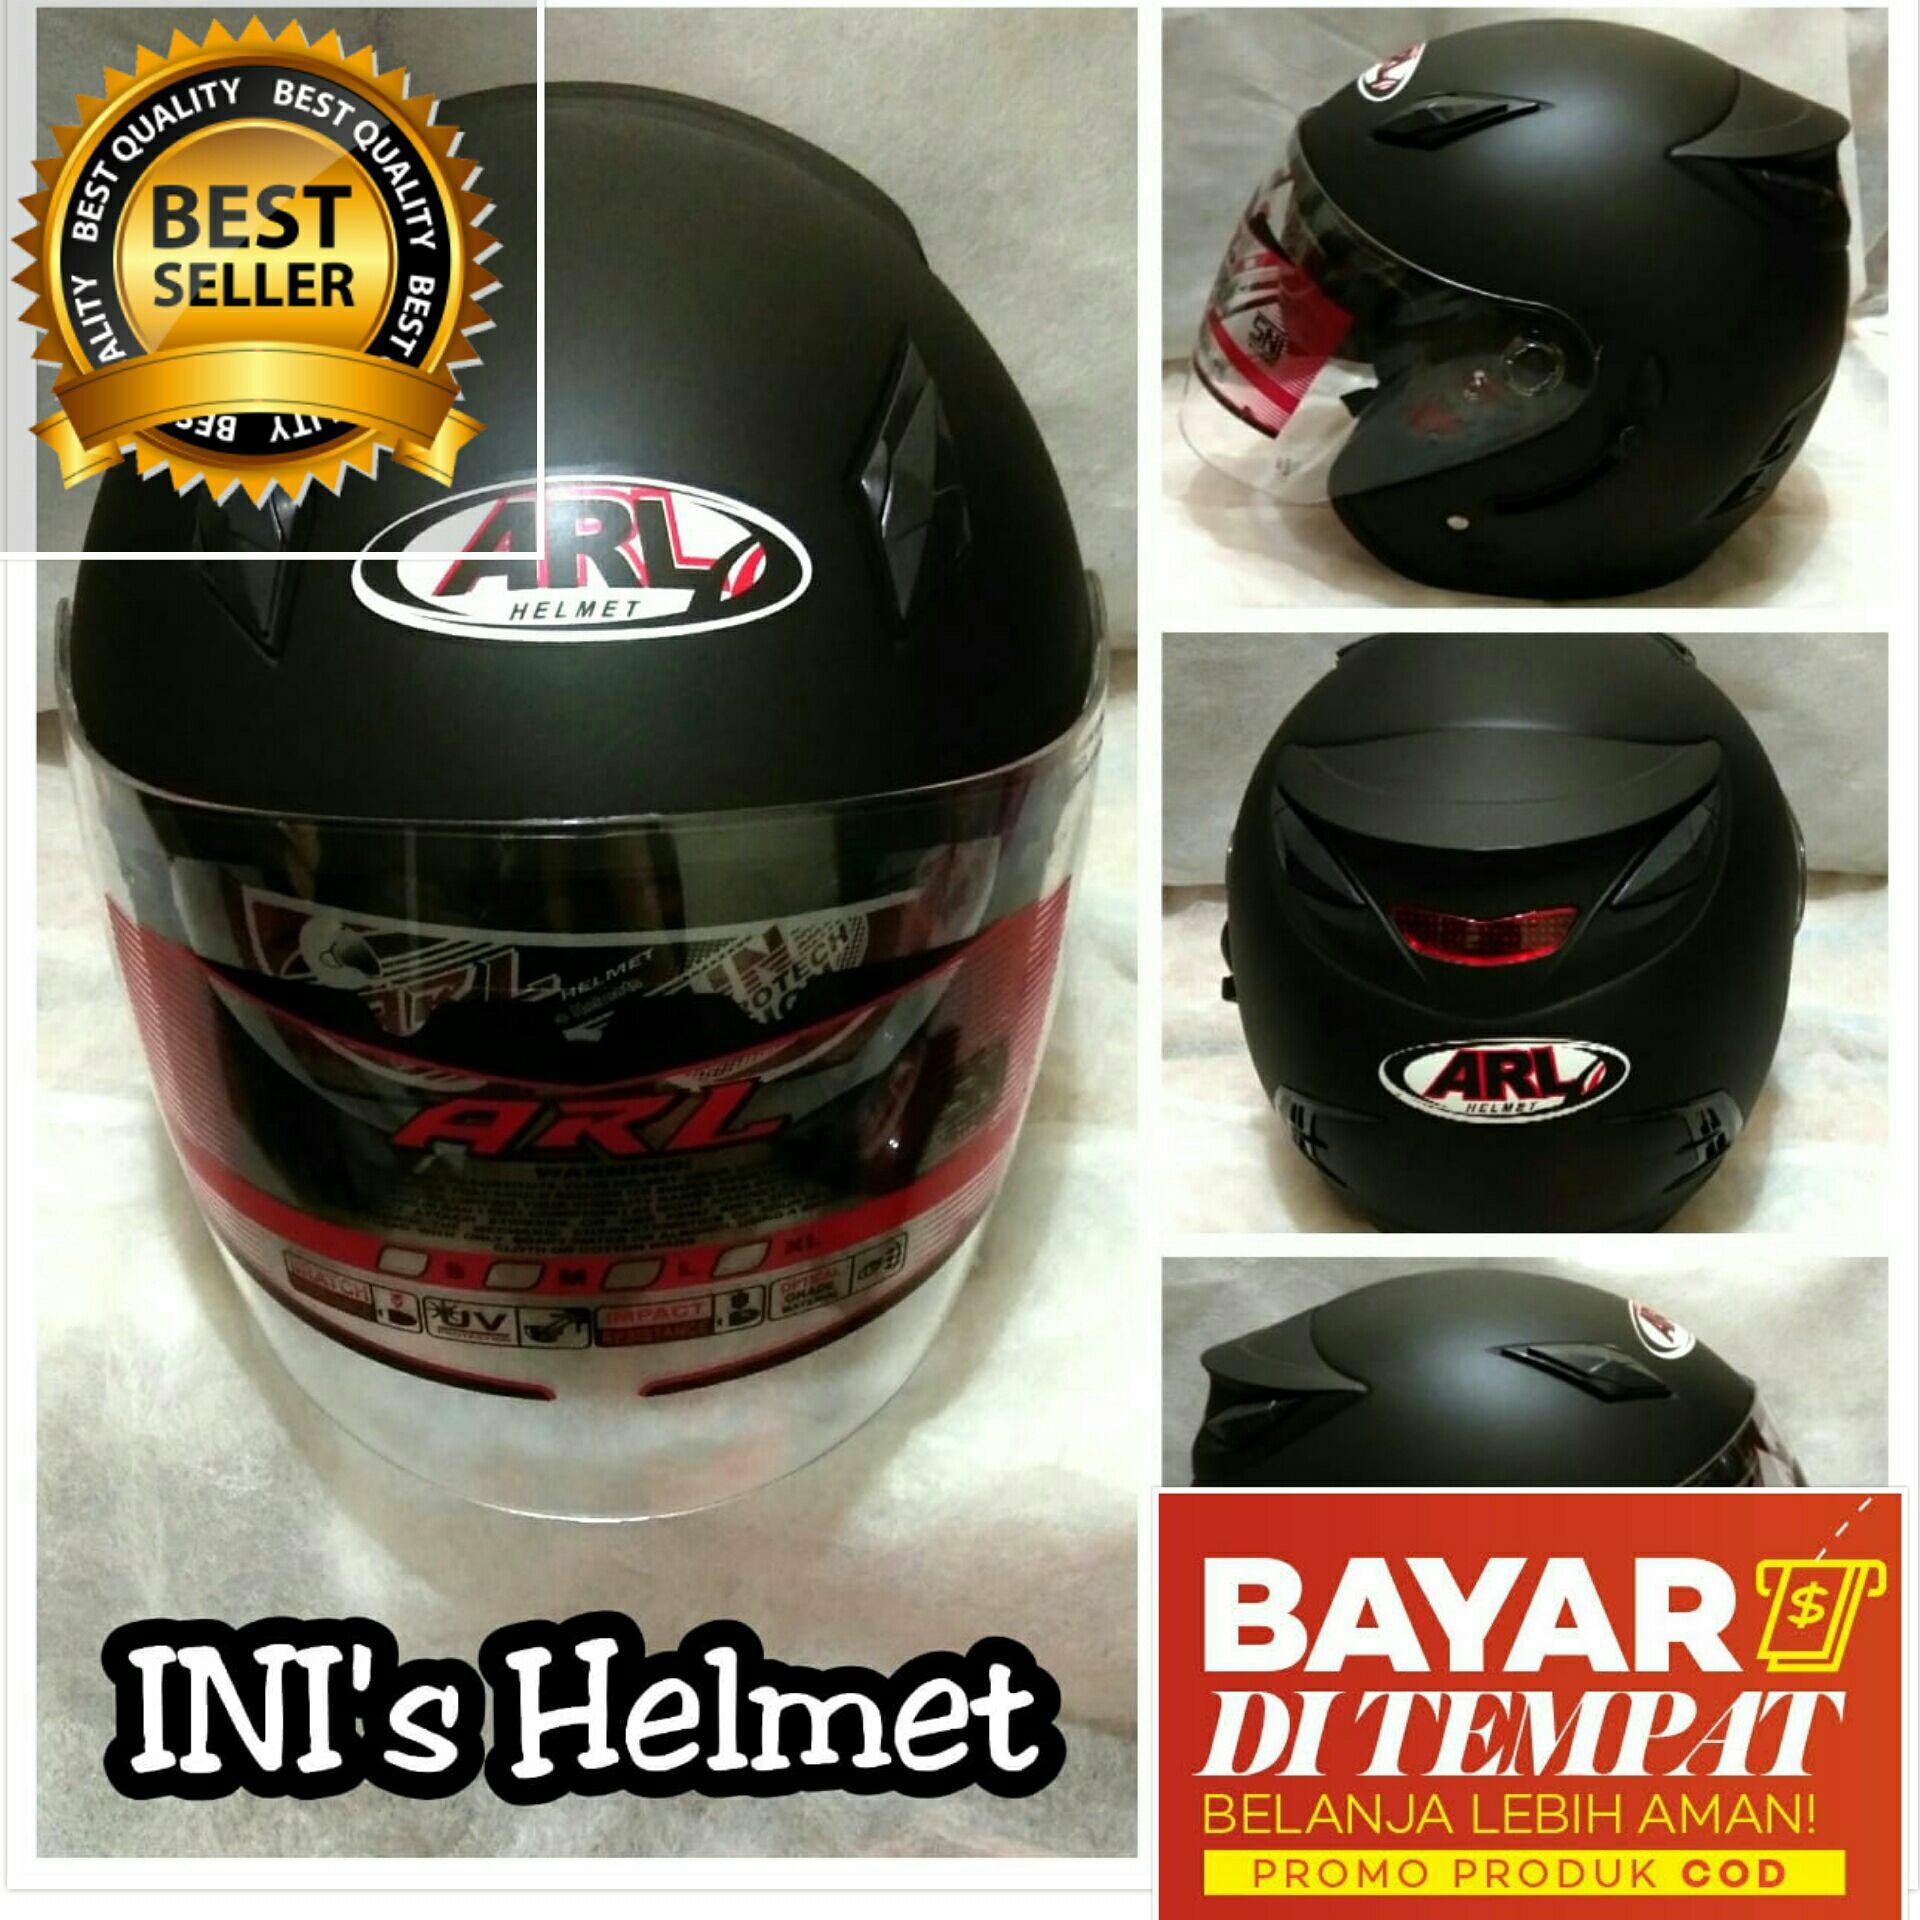 Helm Half Face SNI Helmet polos Hitam Doff Dop keren ARL Helmet Centro Metro not ink centro or kyt dj maru